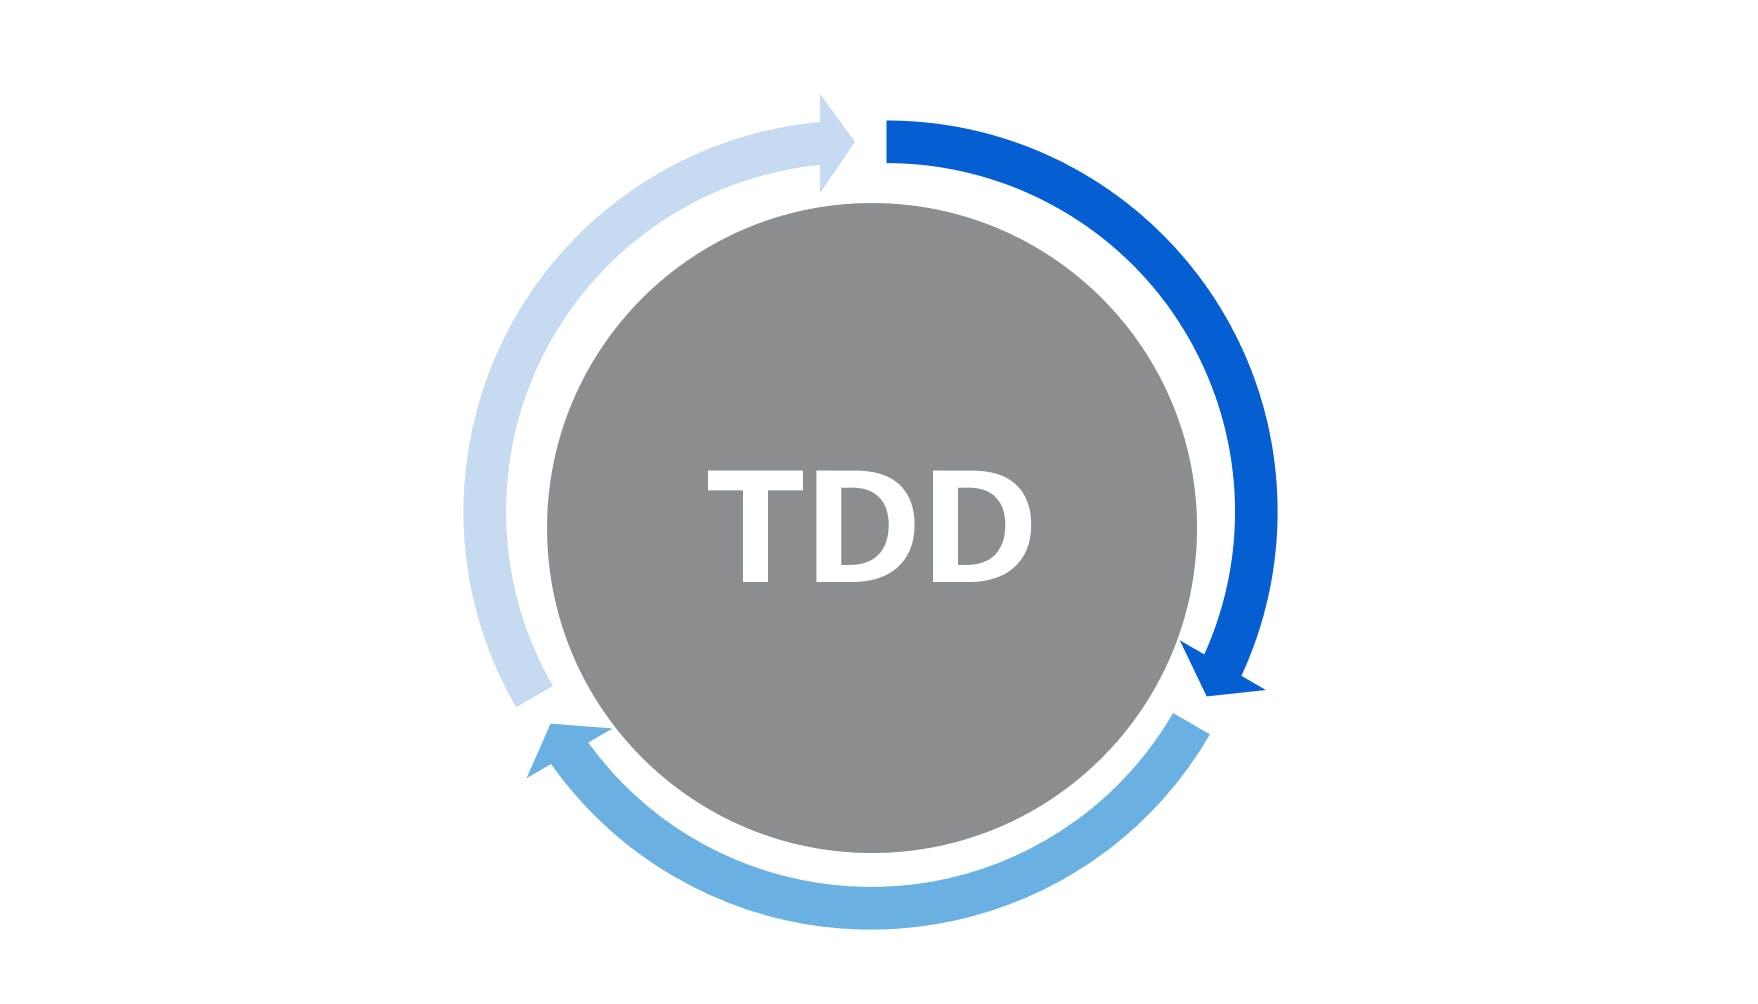 201504_Test_Driven_Development_2_neu_fi.png